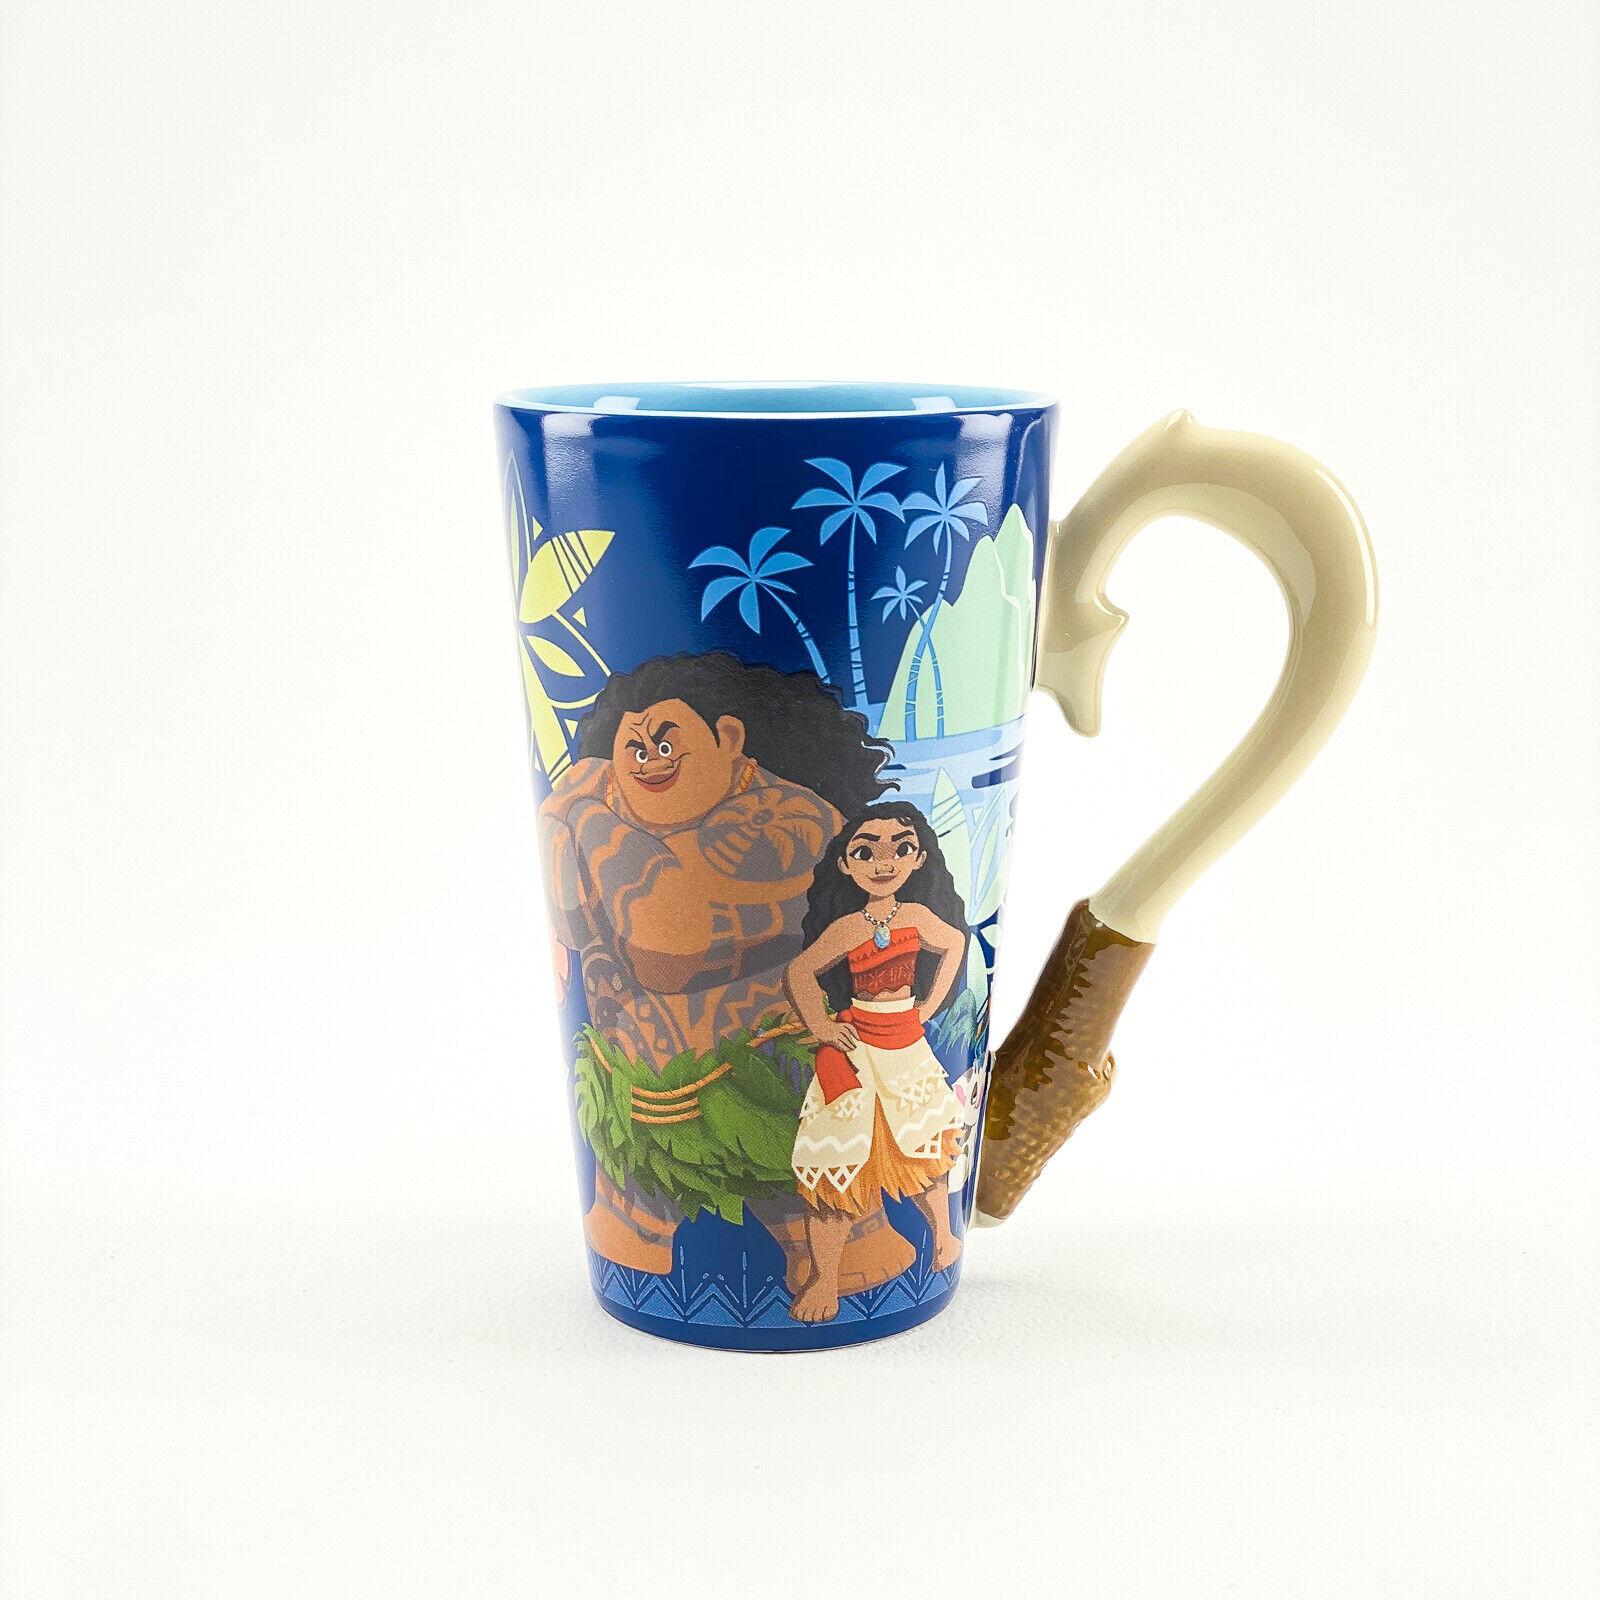 AUTHENTIC DISNEY STORE Moana Fishhook Mug